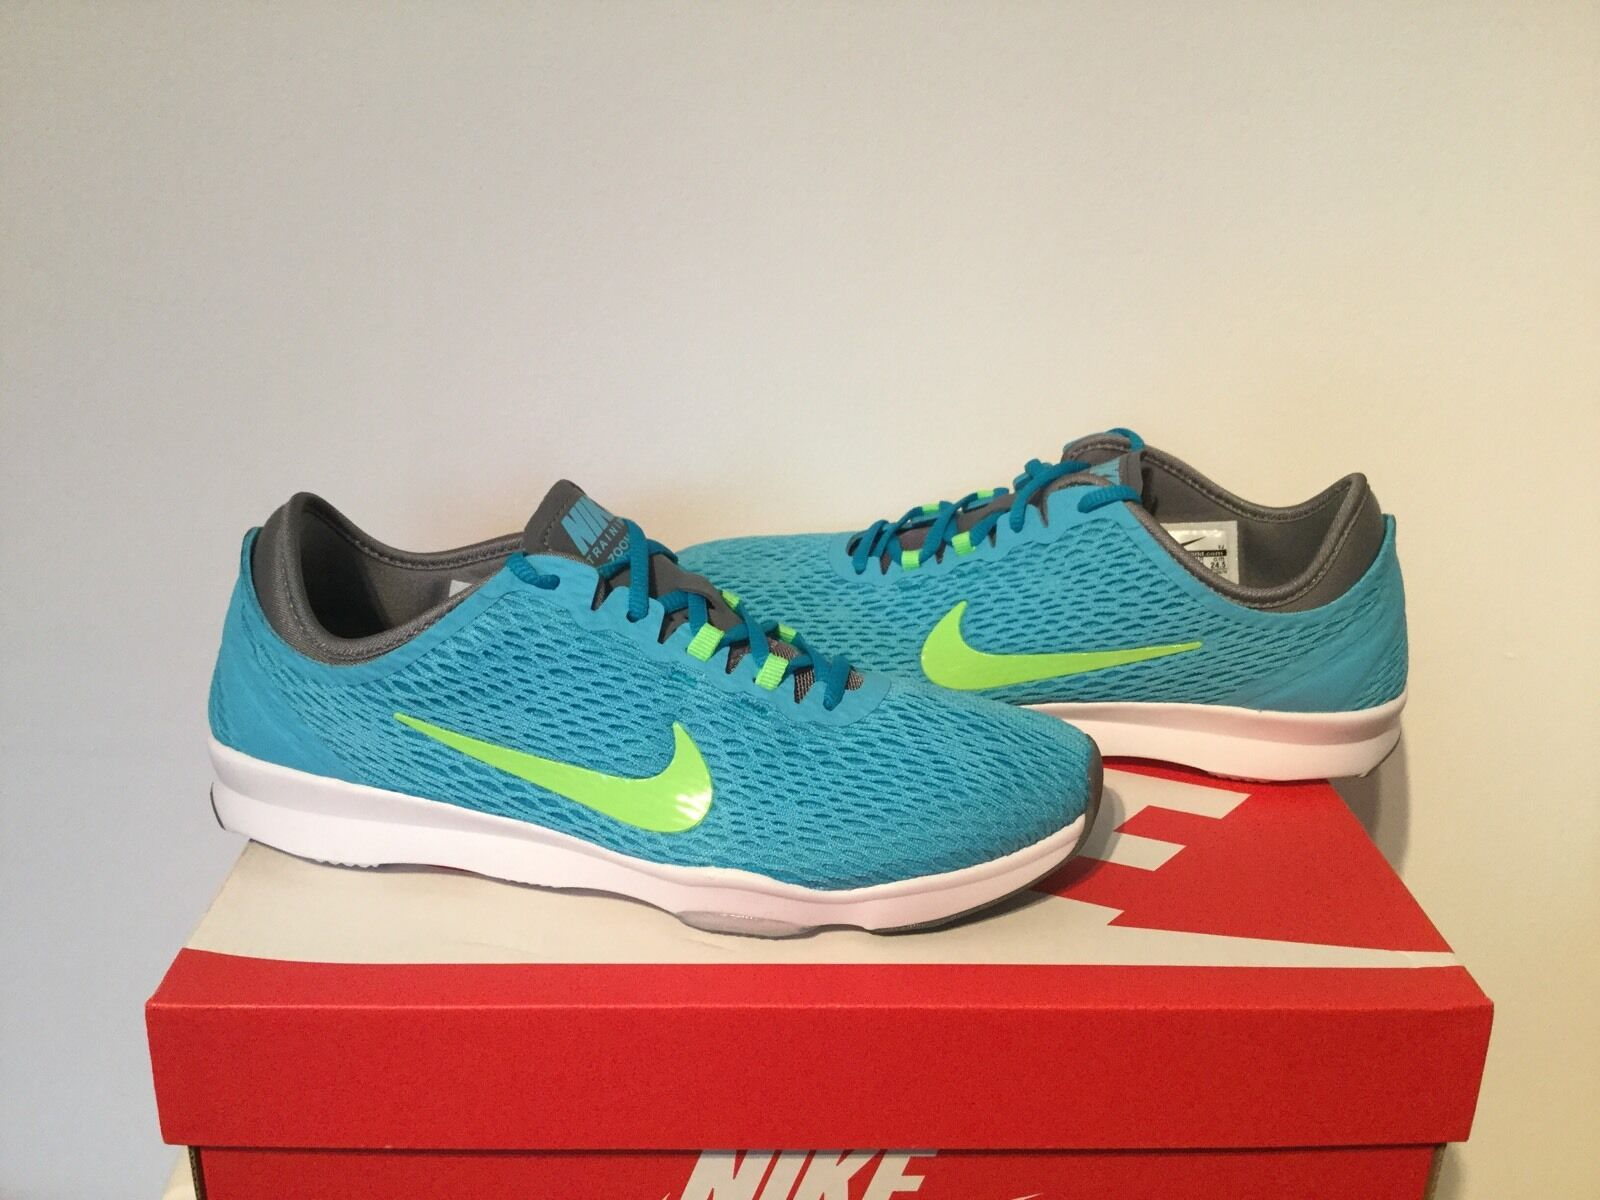 Nike Zoom Fit. UK Talla 5 5 5  El ultimo 2018